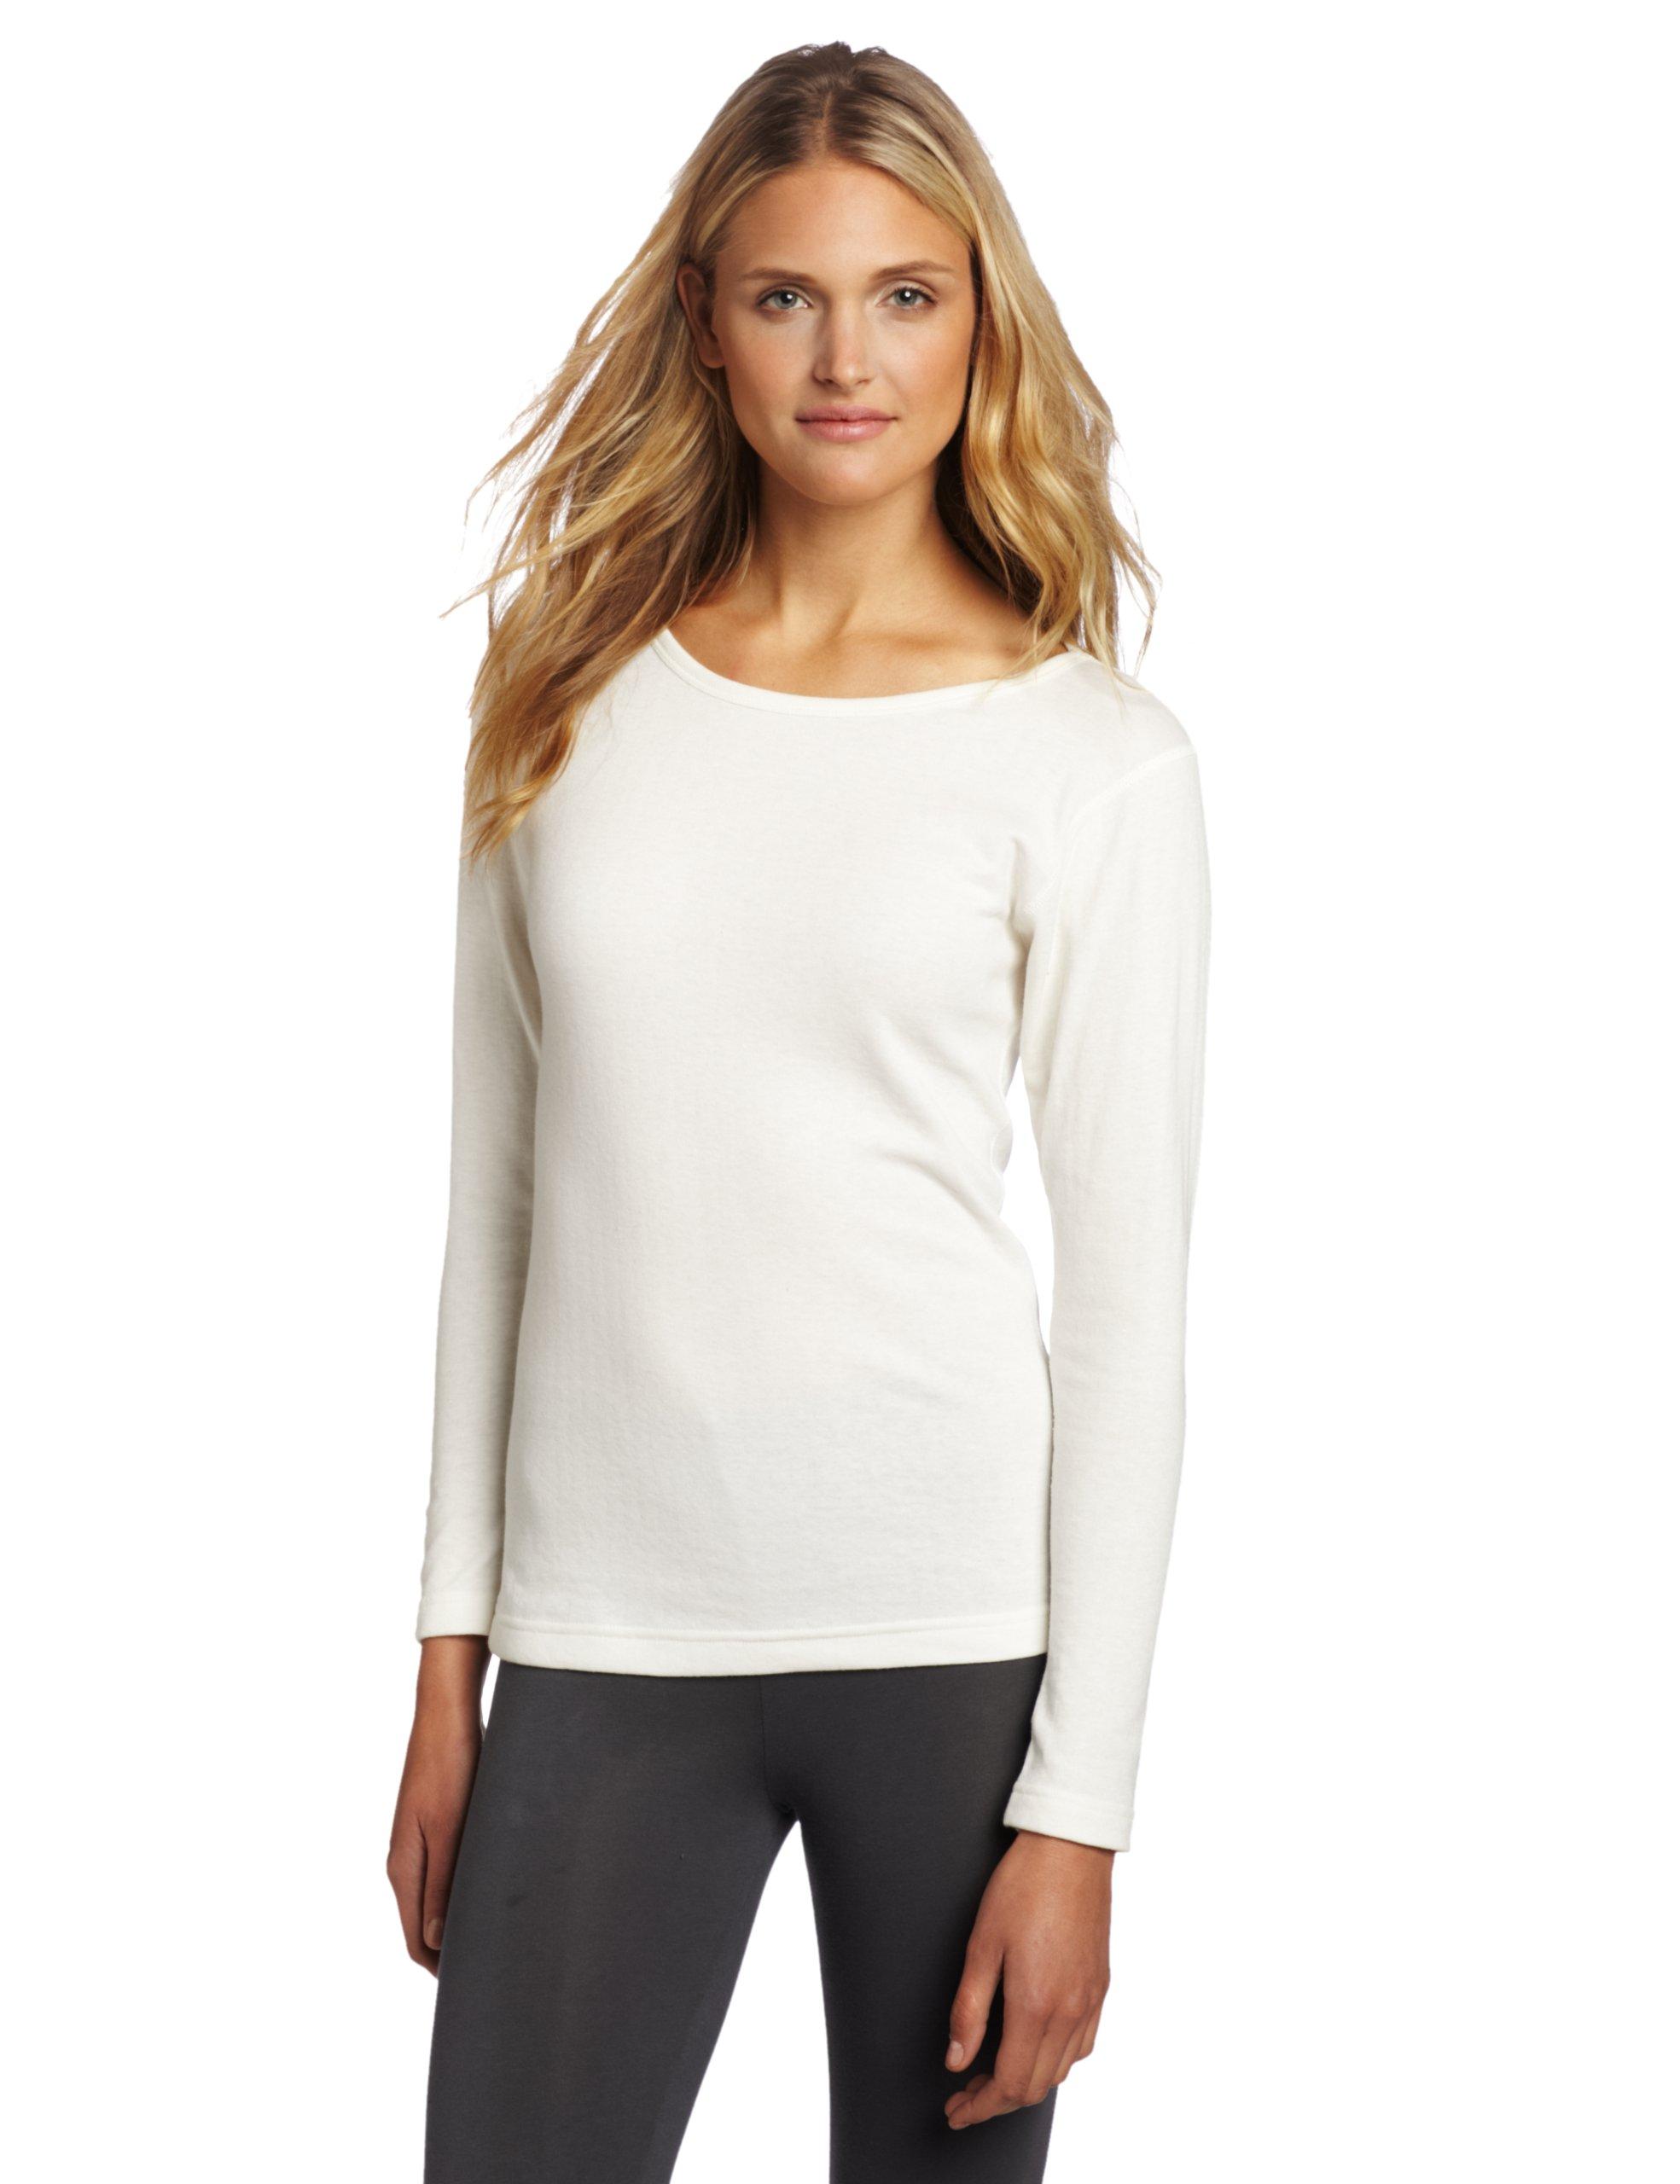 Duofold Women's Mid Weight Double Layer Thermal Shirt, Winter White, Medium